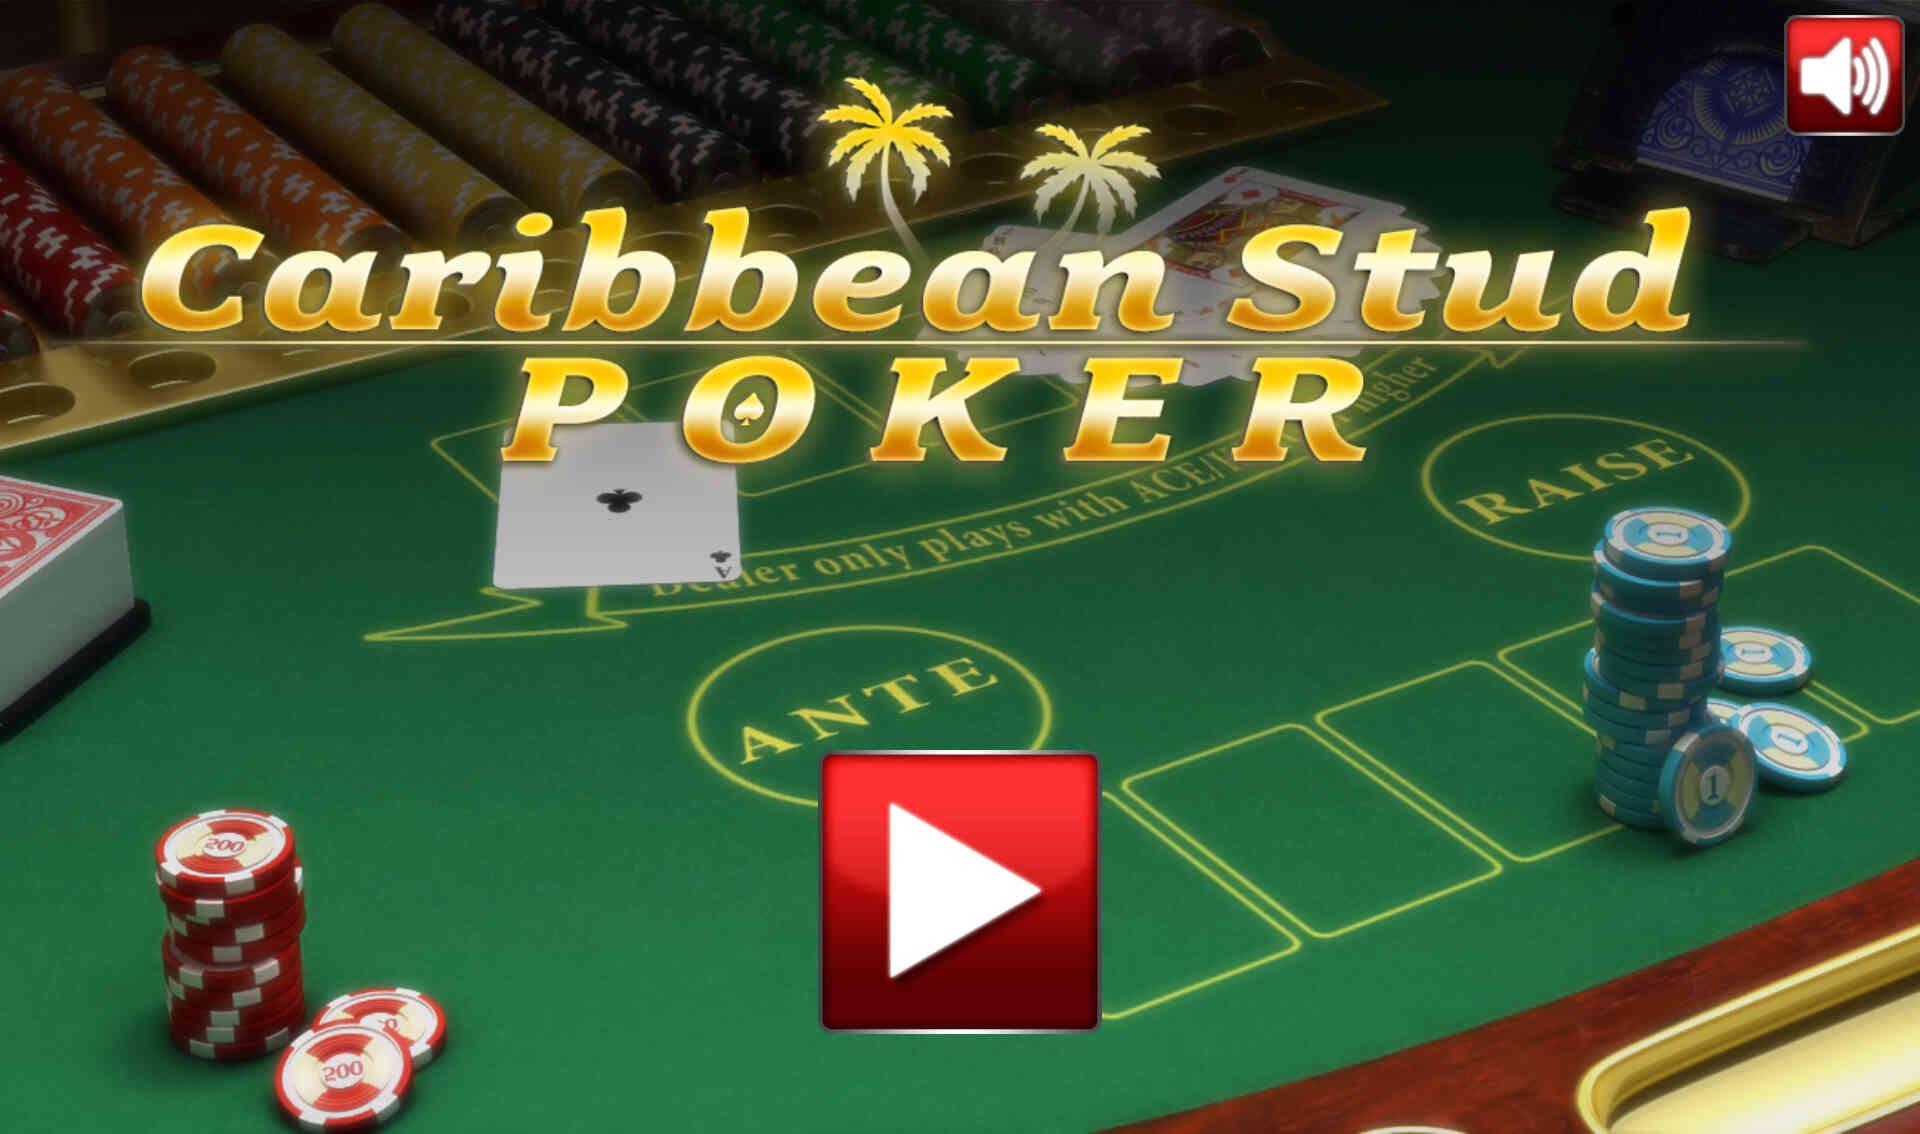 Image Caribbean Stud Poker